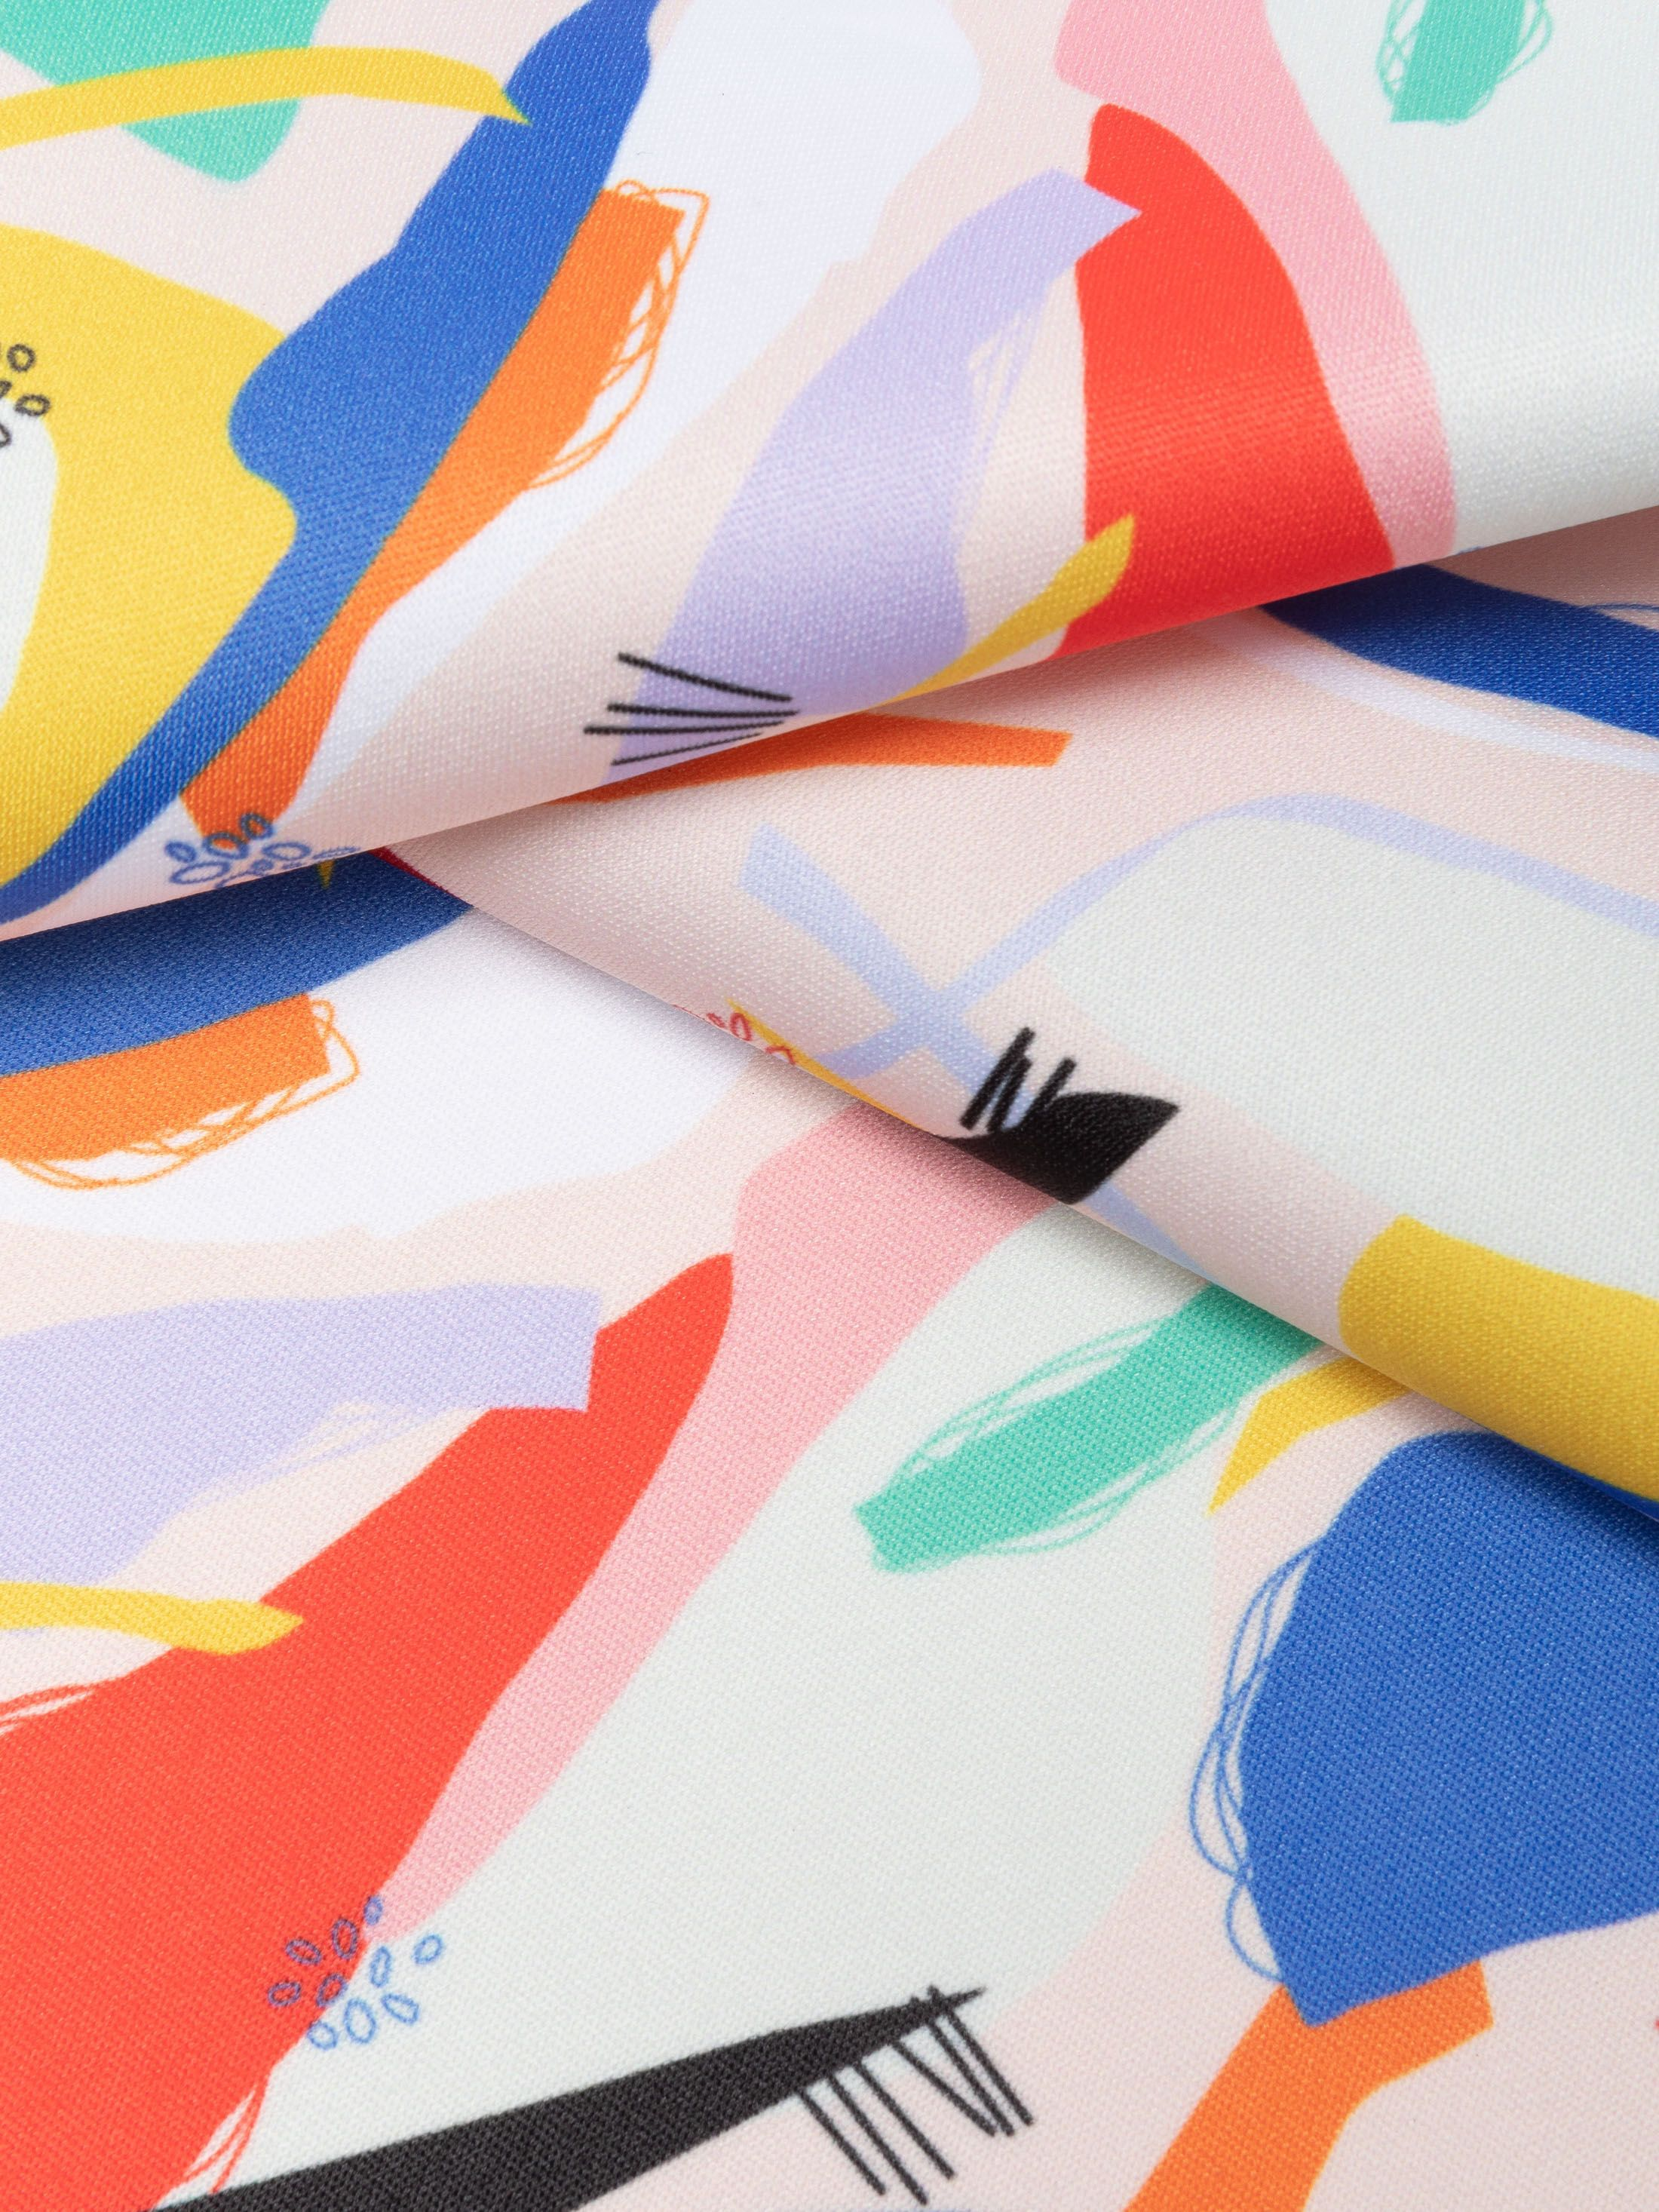 Monroe Satijn met gepersonaliseerde print rand opties